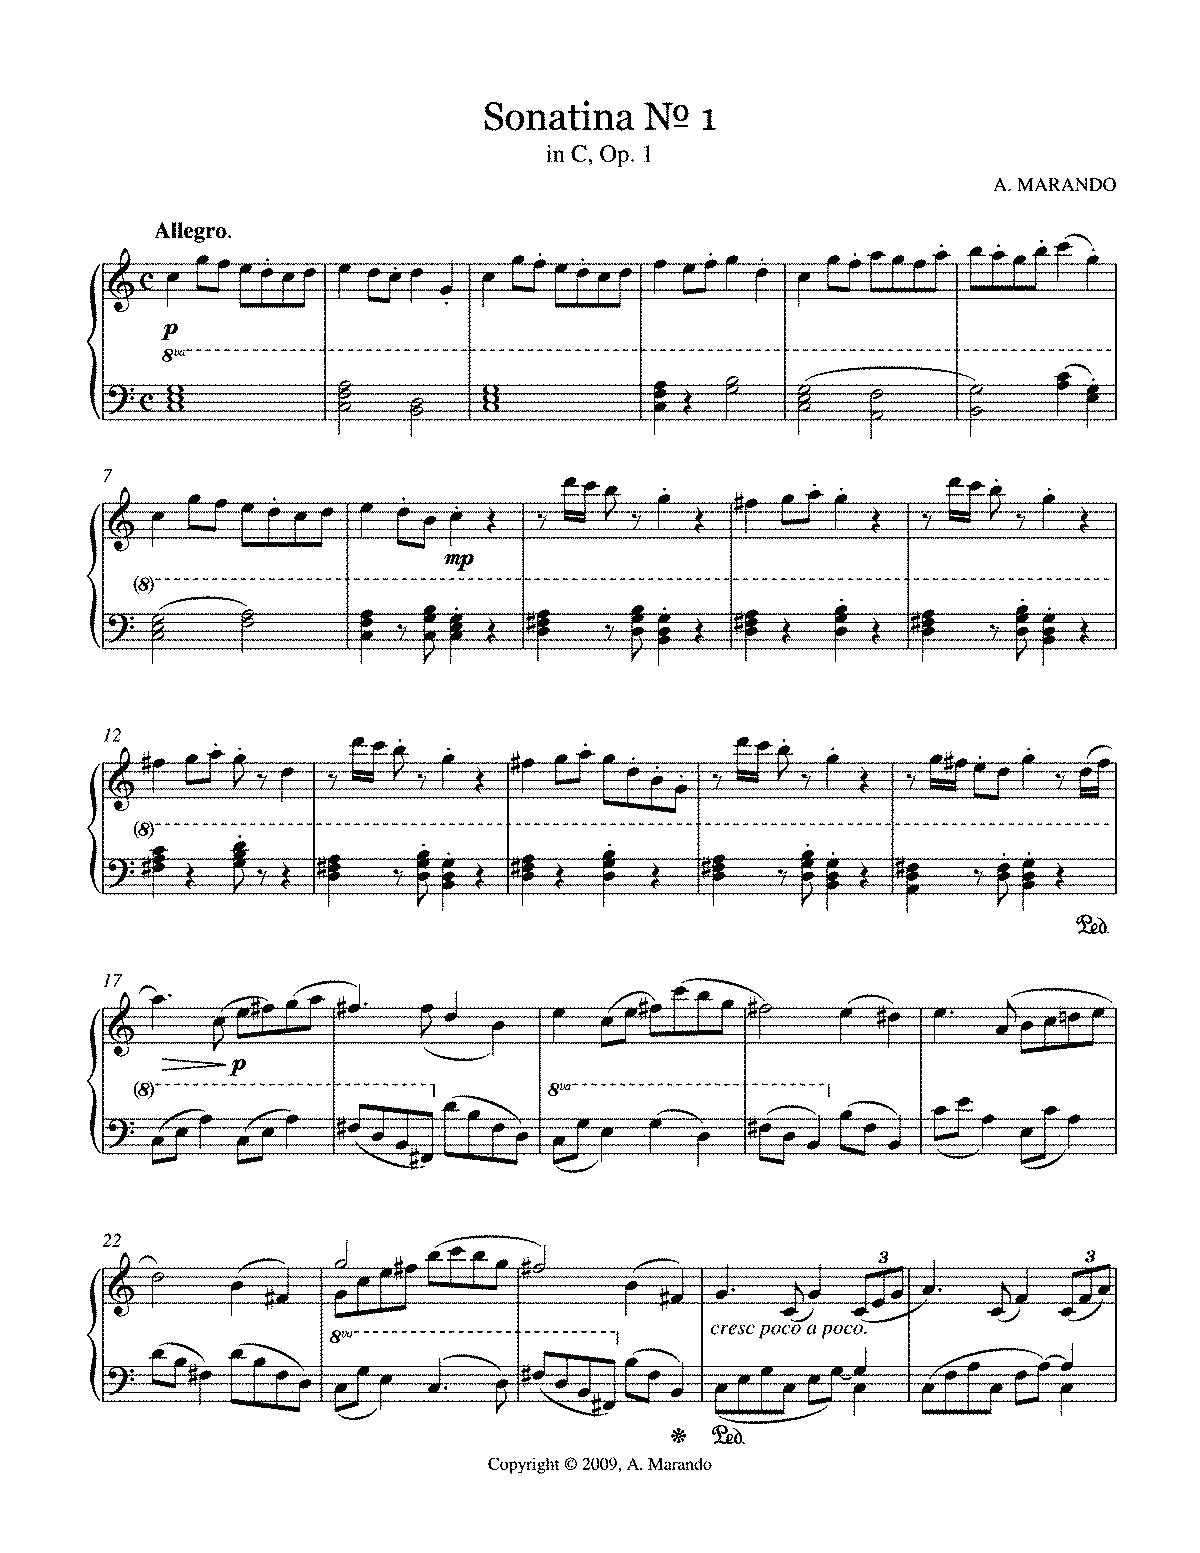 Sonatina No 1, Op 1 (Marando, A ) - IMSLP/Petrucci Music Library